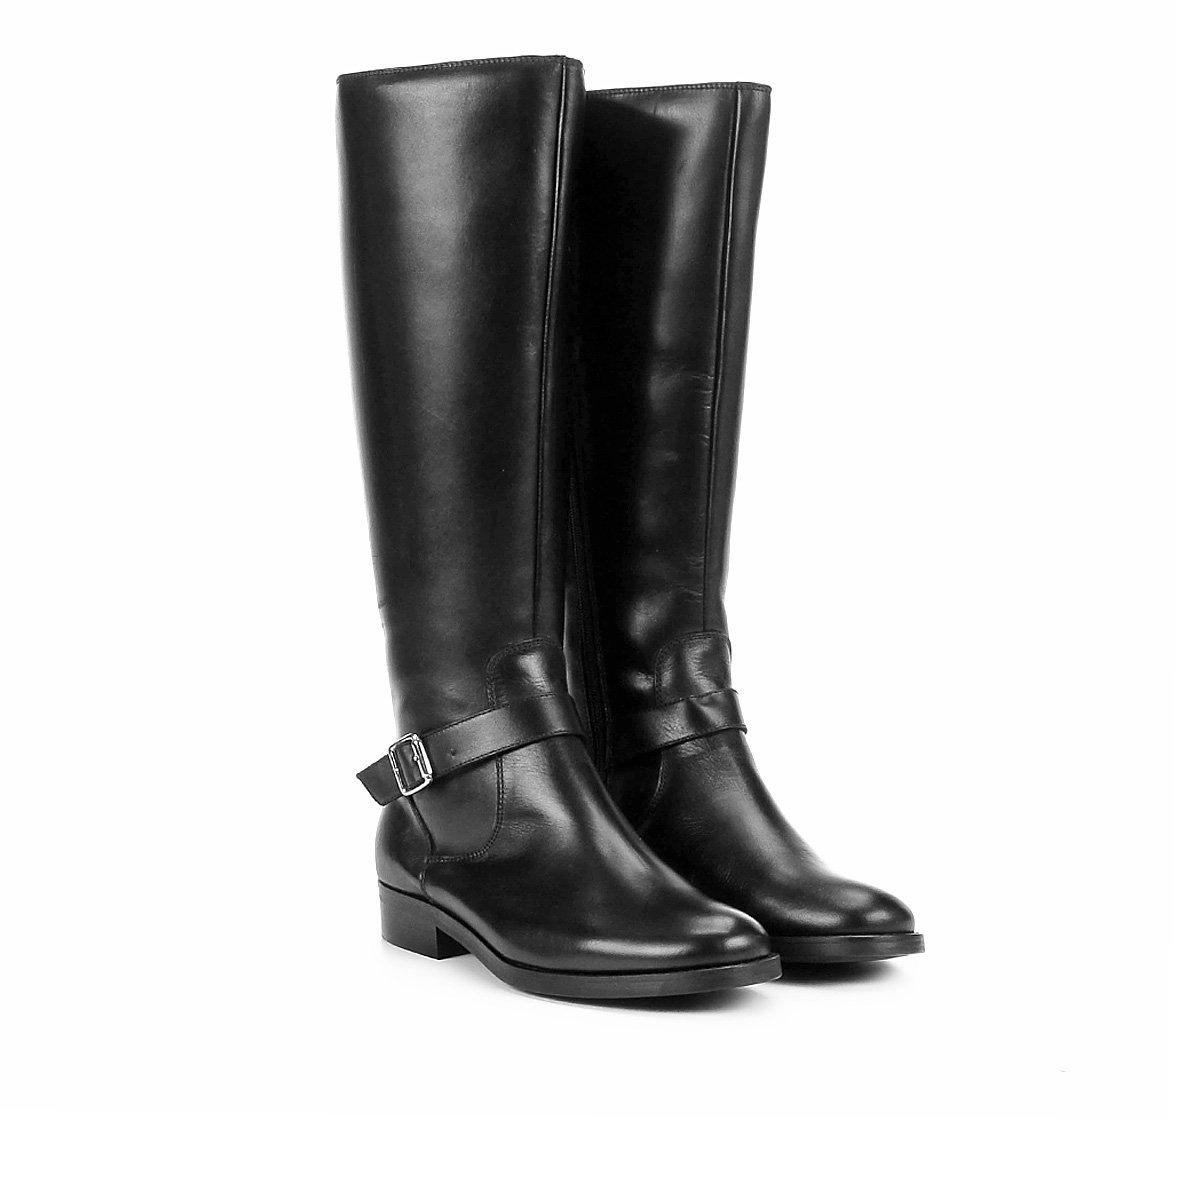 564650b86 Bota Couro Cano Curto Shoestock Montaria Feminina - Compre Agora ...